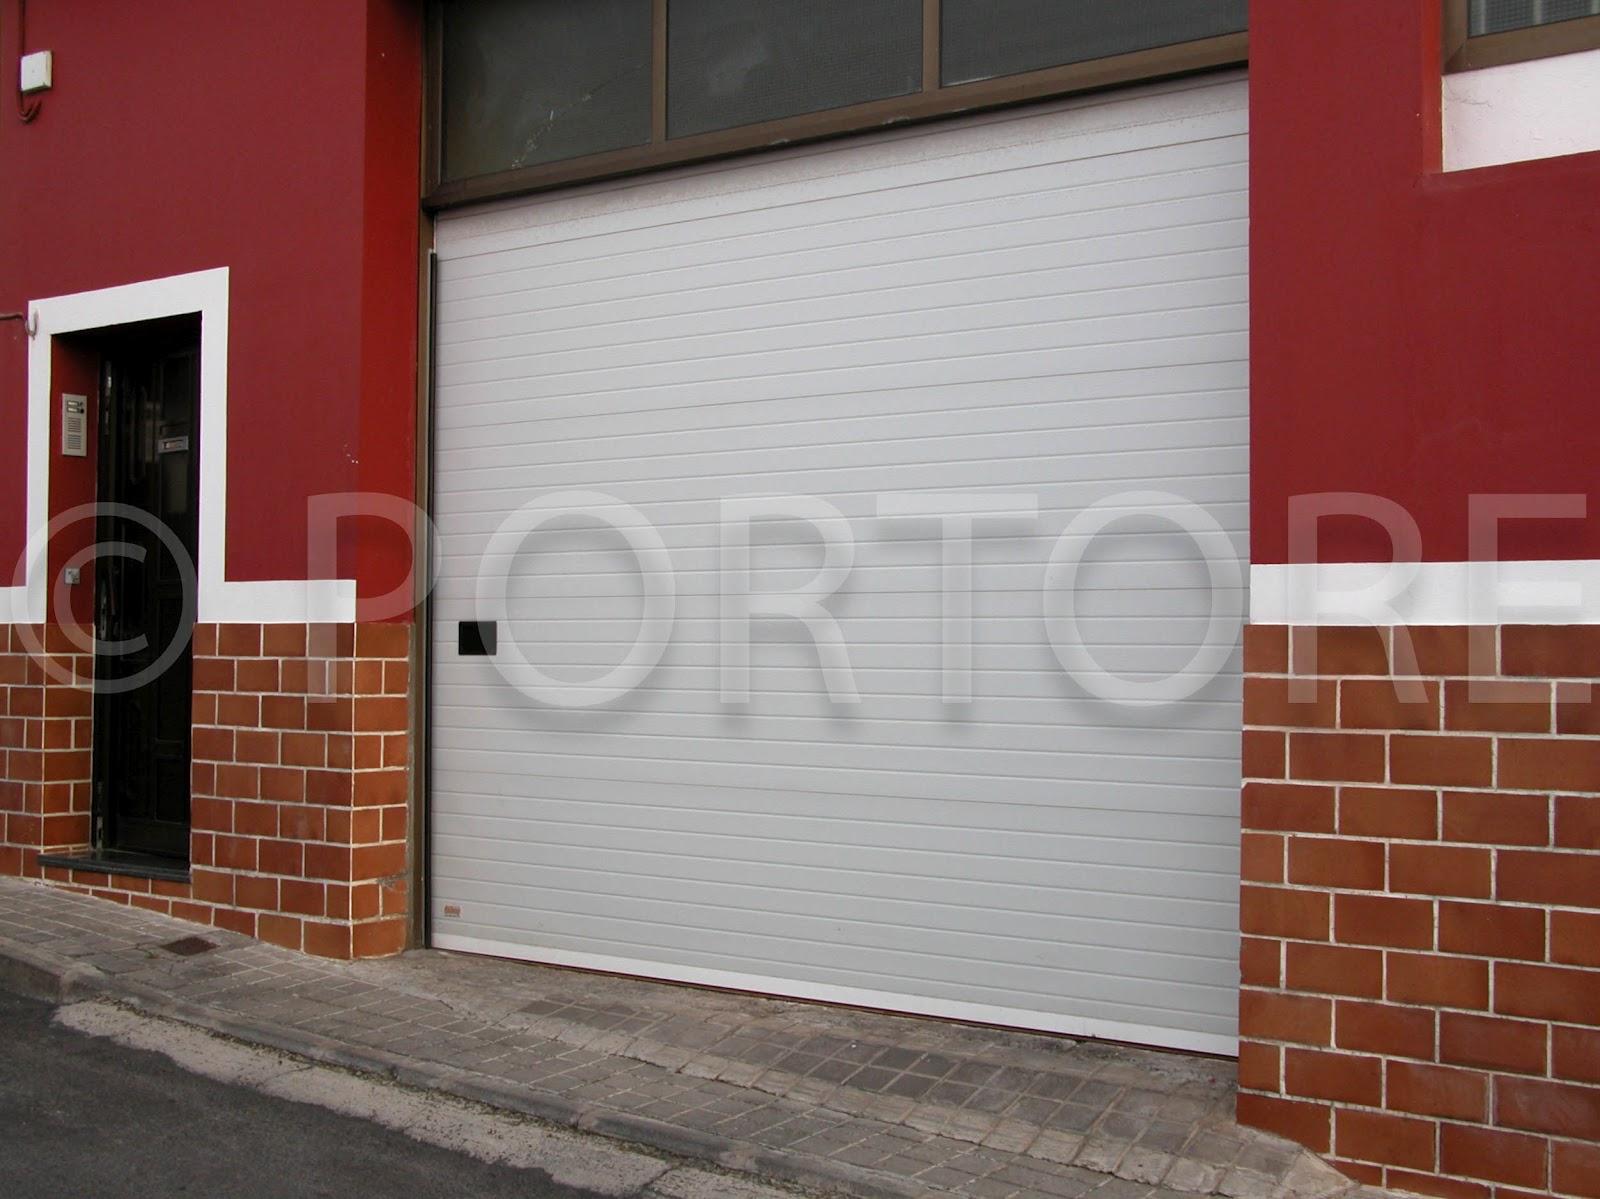 Portore s a puertas correderas de panel sandwich for Panel sandwich aluminio